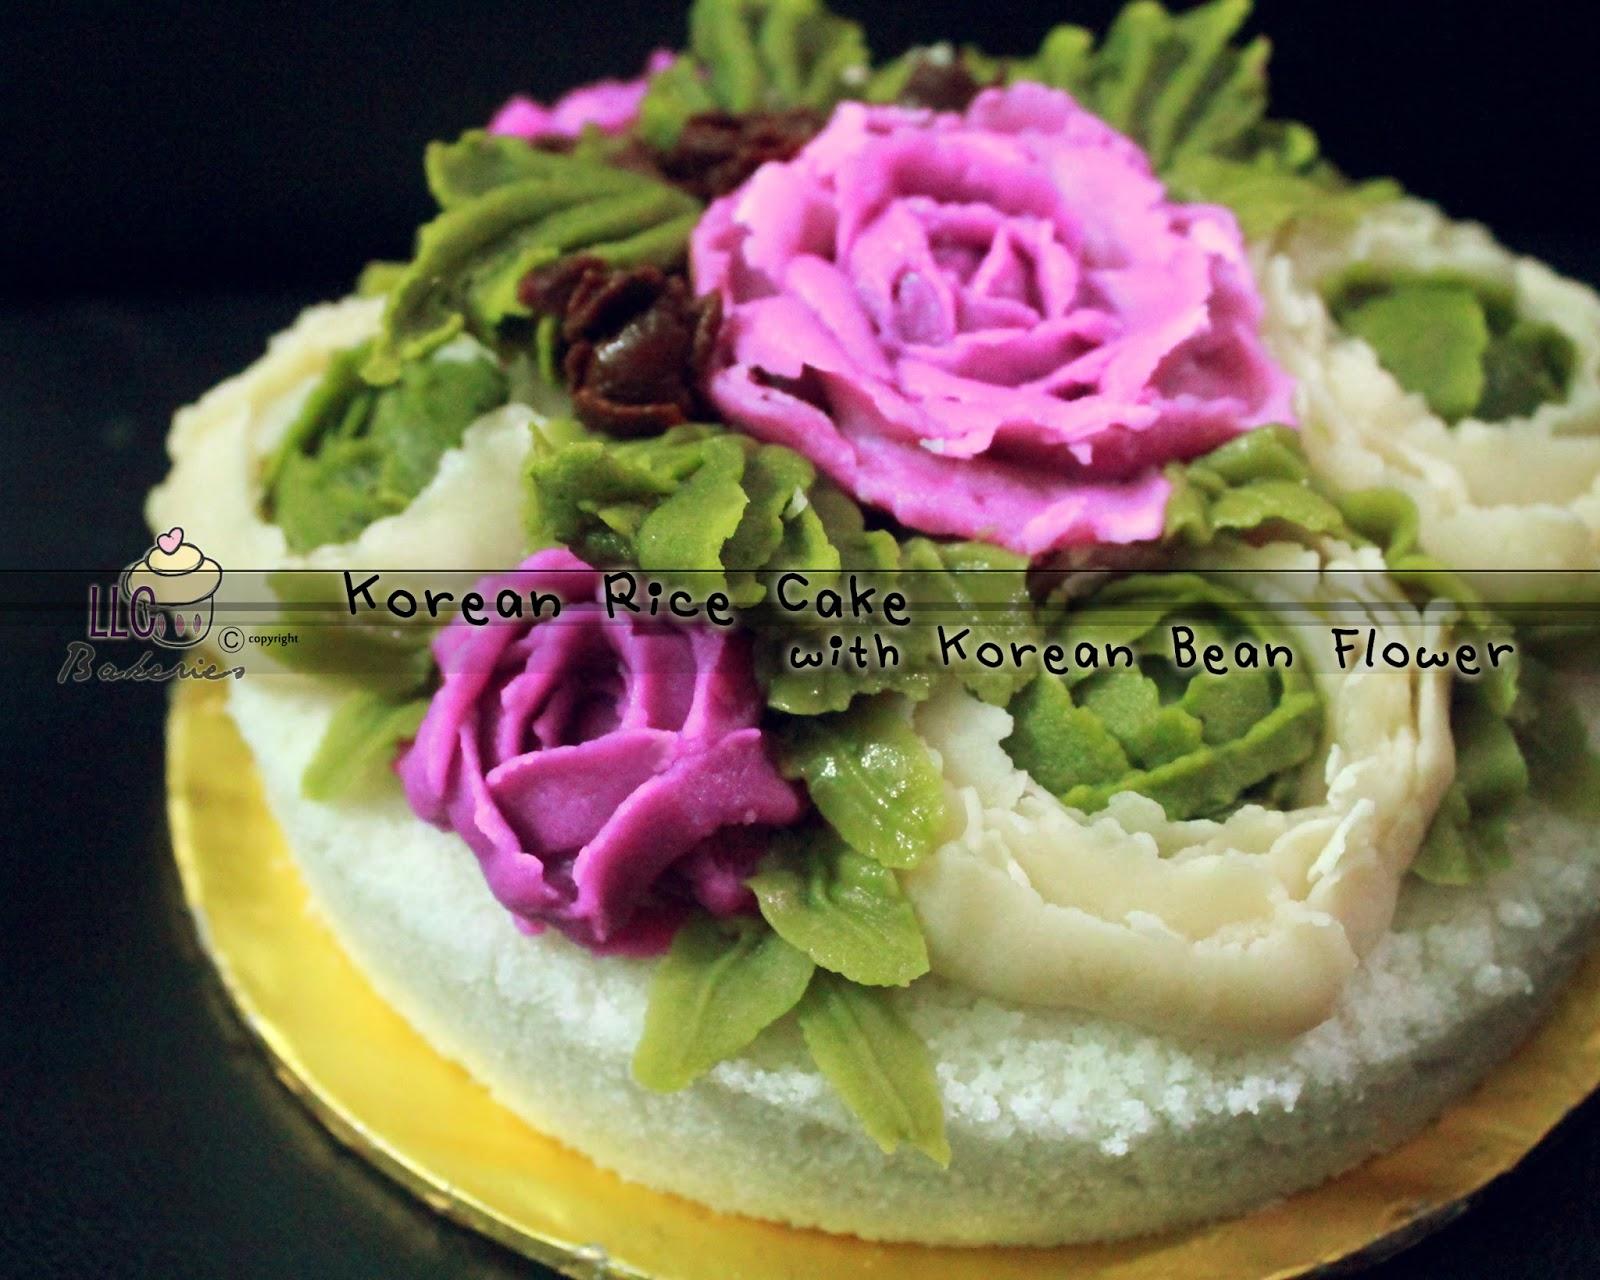 Llc Bakeries Korean Rice Cake Baekseolgi With Korean Bean Flower